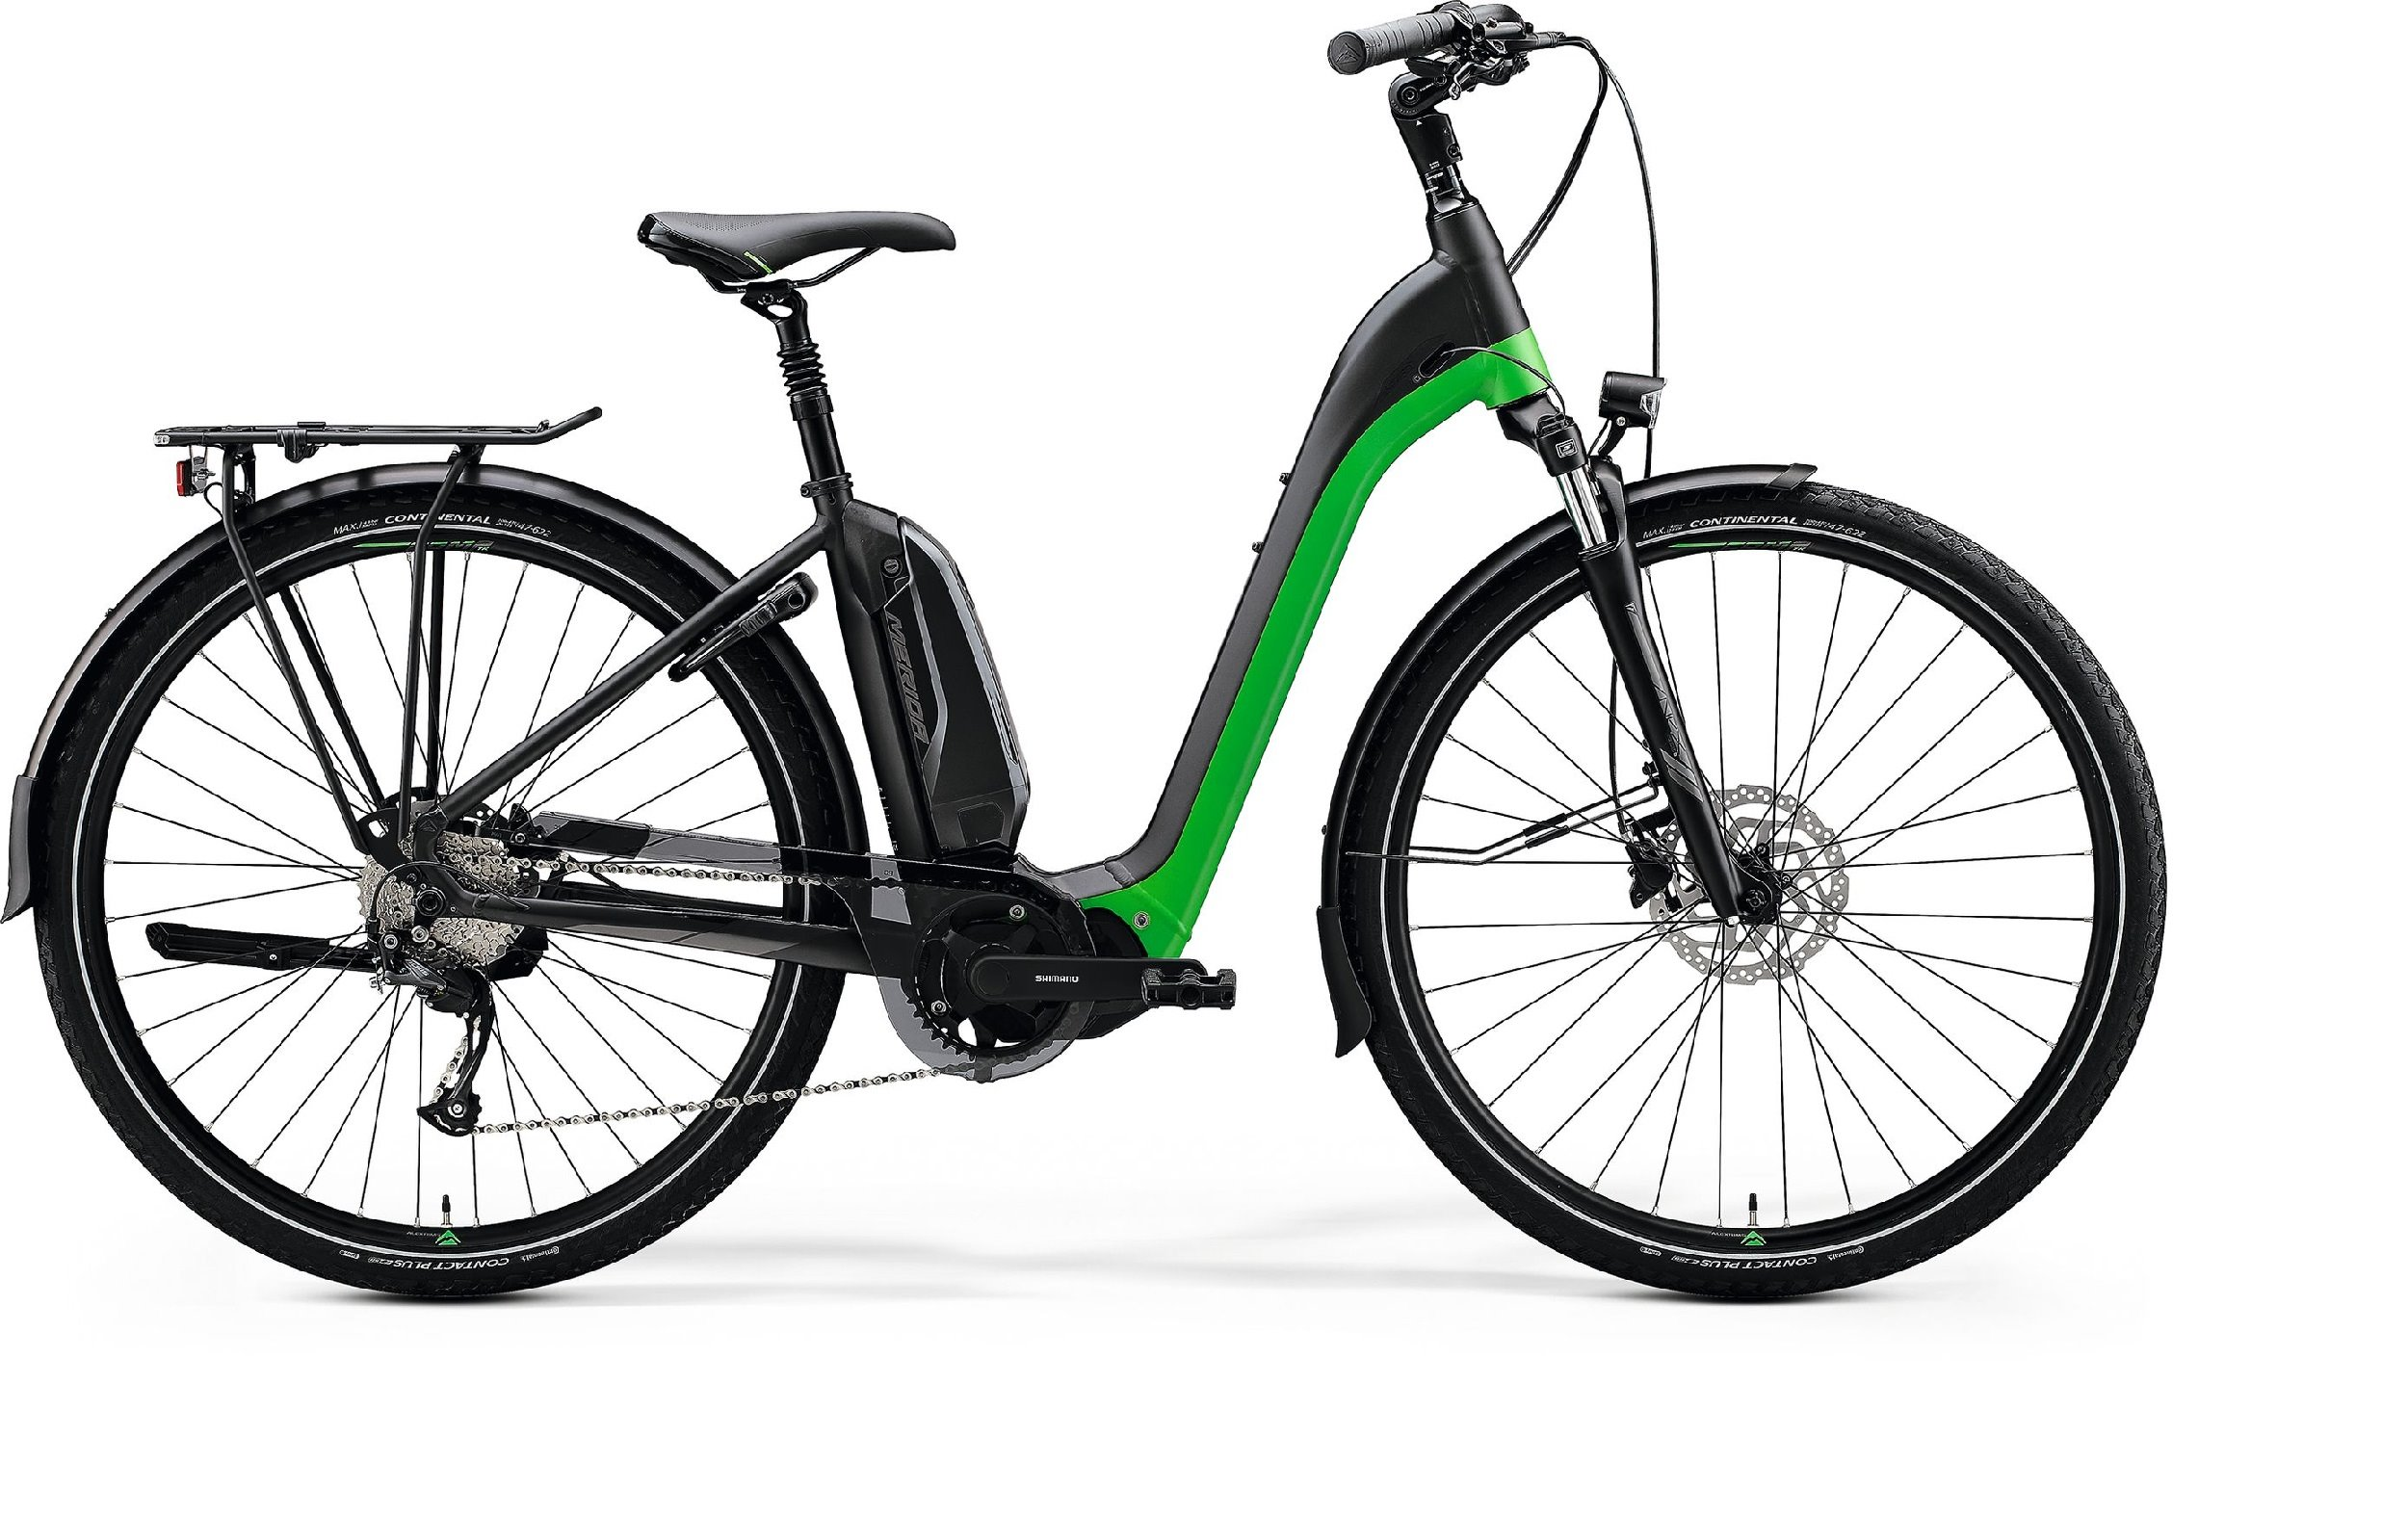 Merida eSPRESSO CITY 200 EQ černé/zelené (165-180 cm)